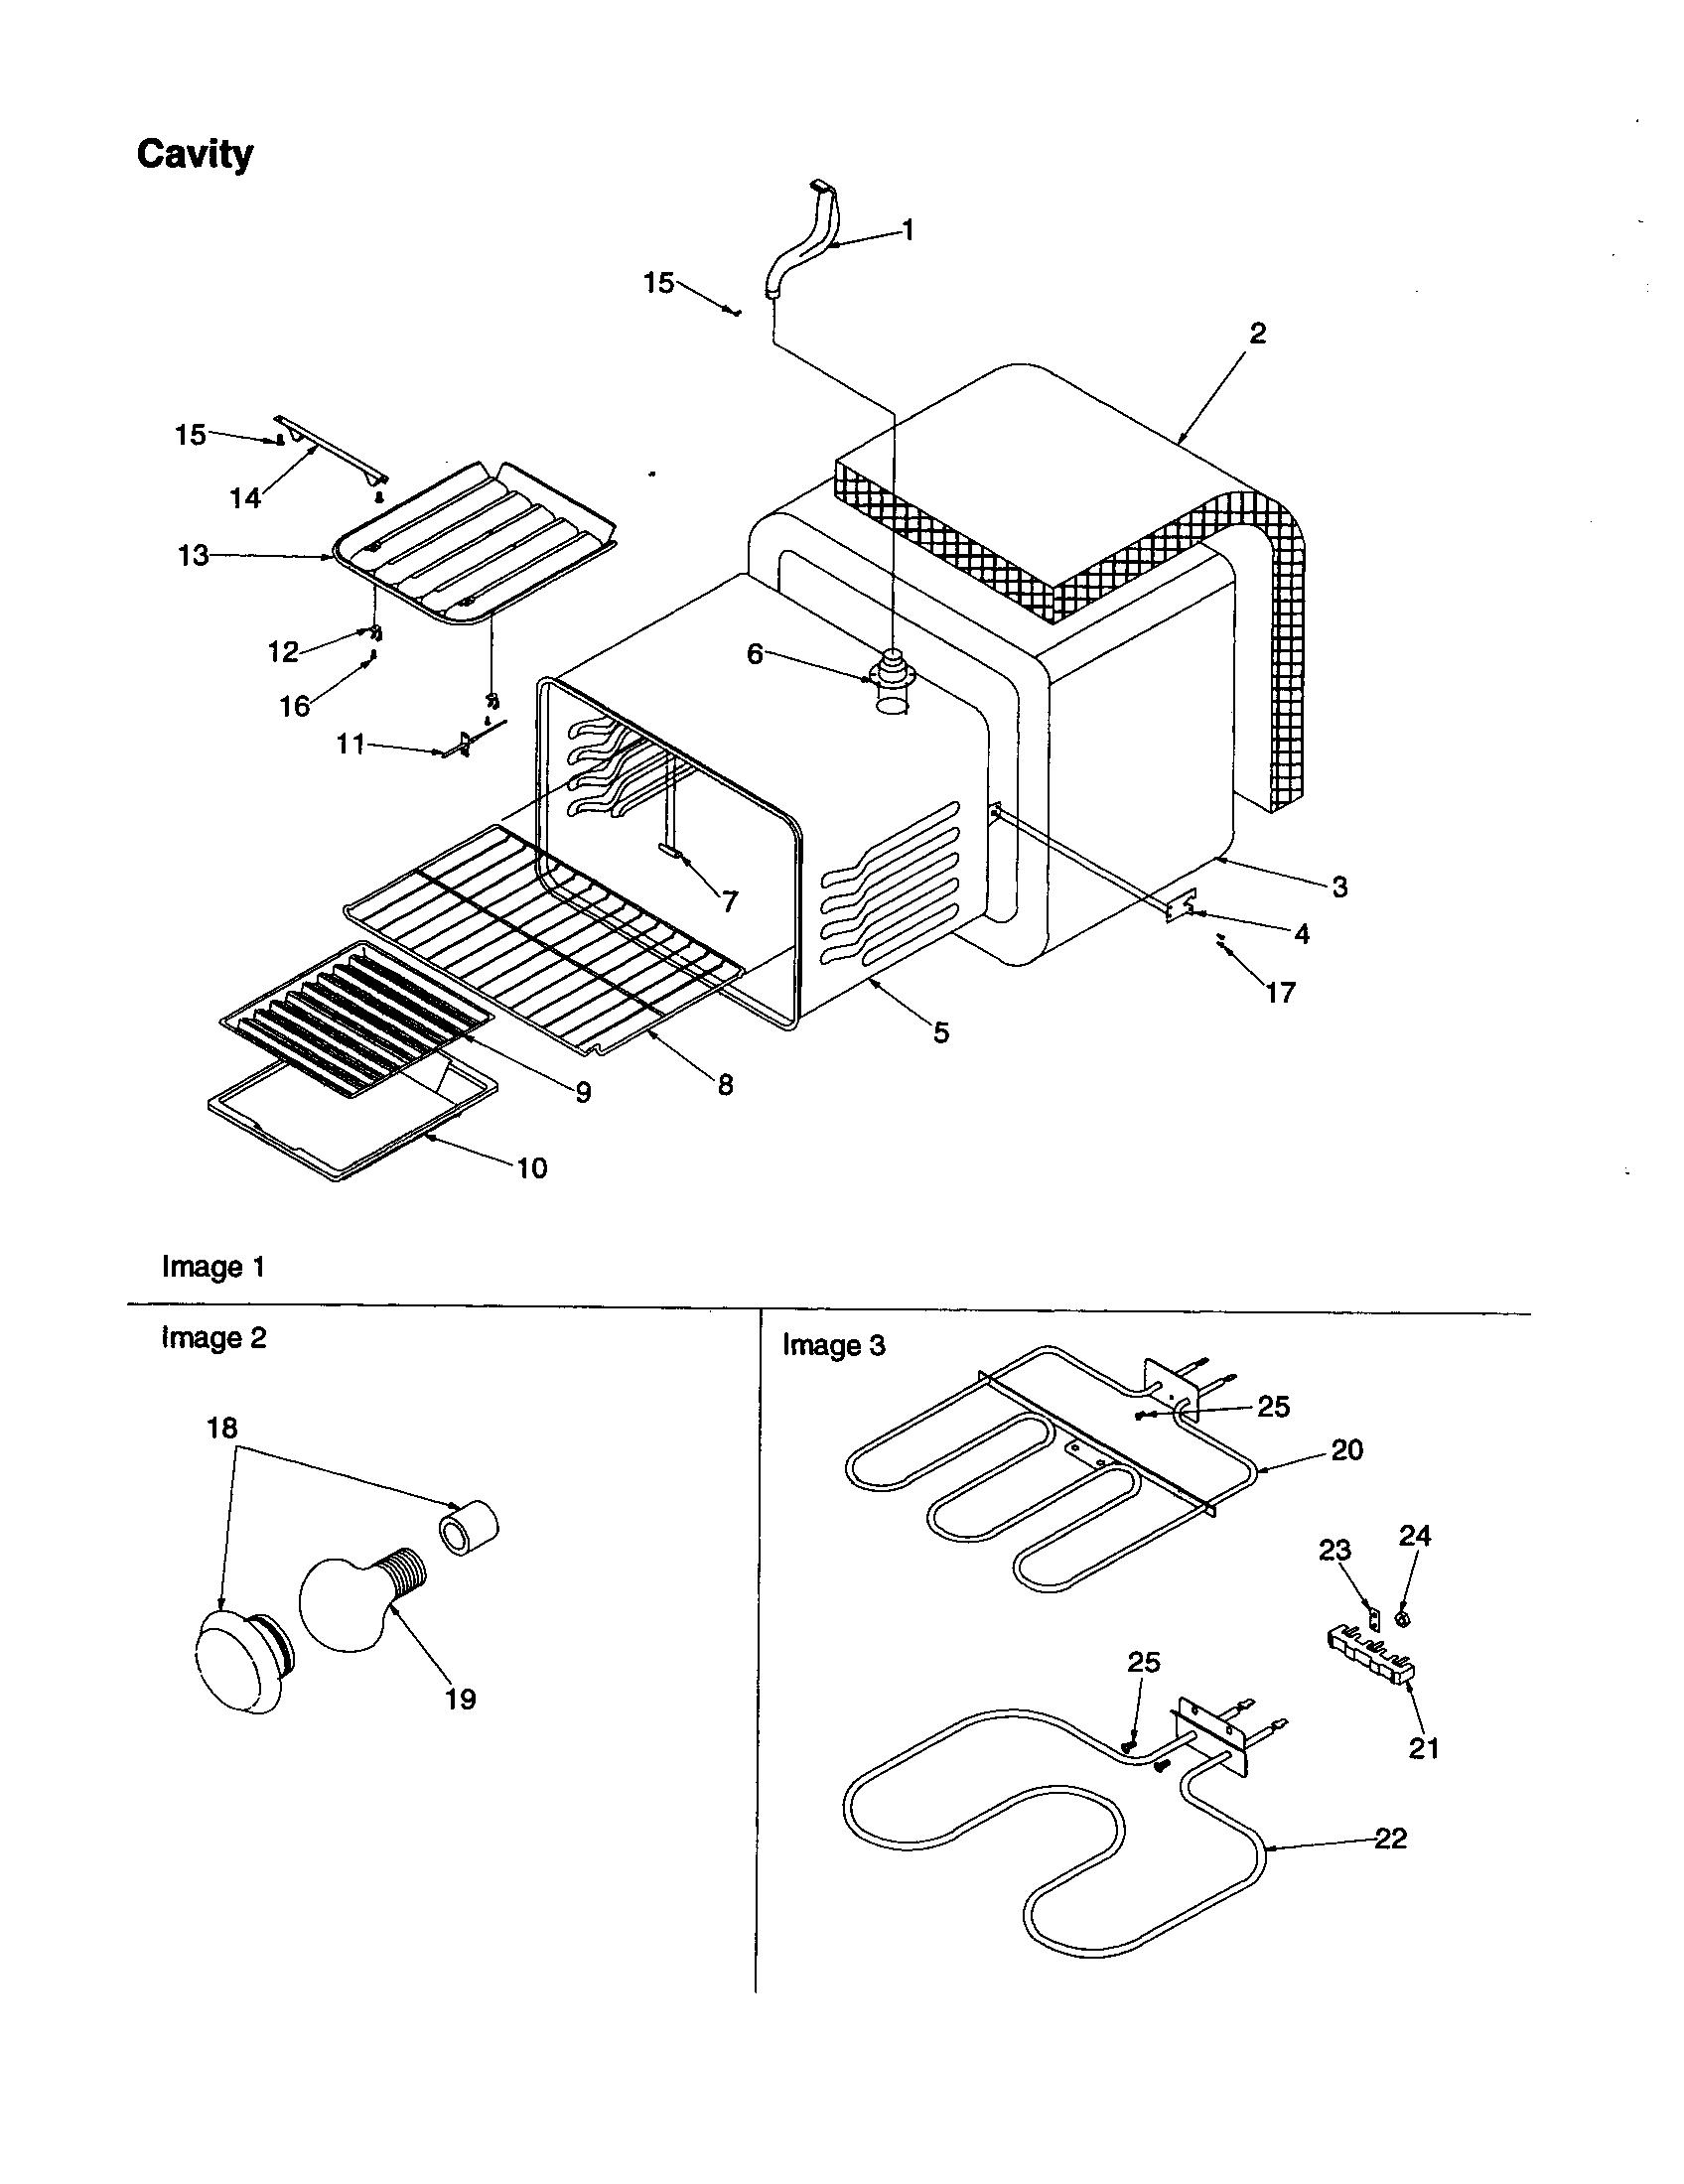 amana dishwasher wiring diagram  amana  free engine image for user manual download